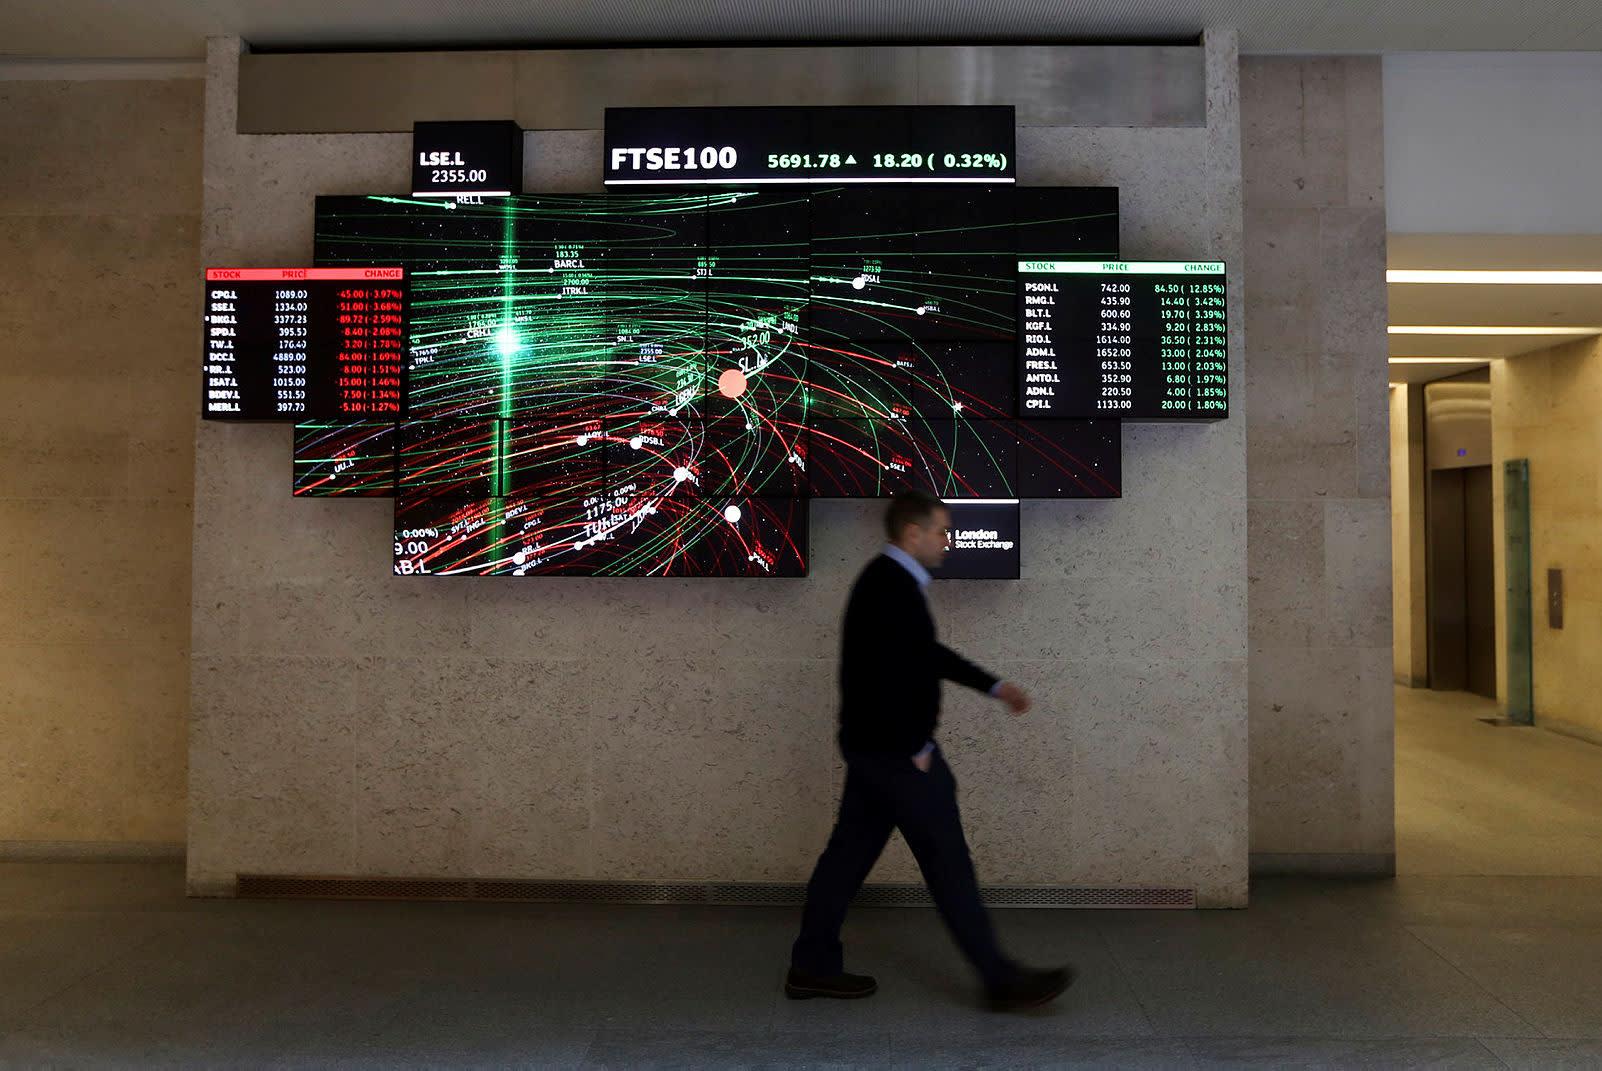 Bestinvest names top fund picks